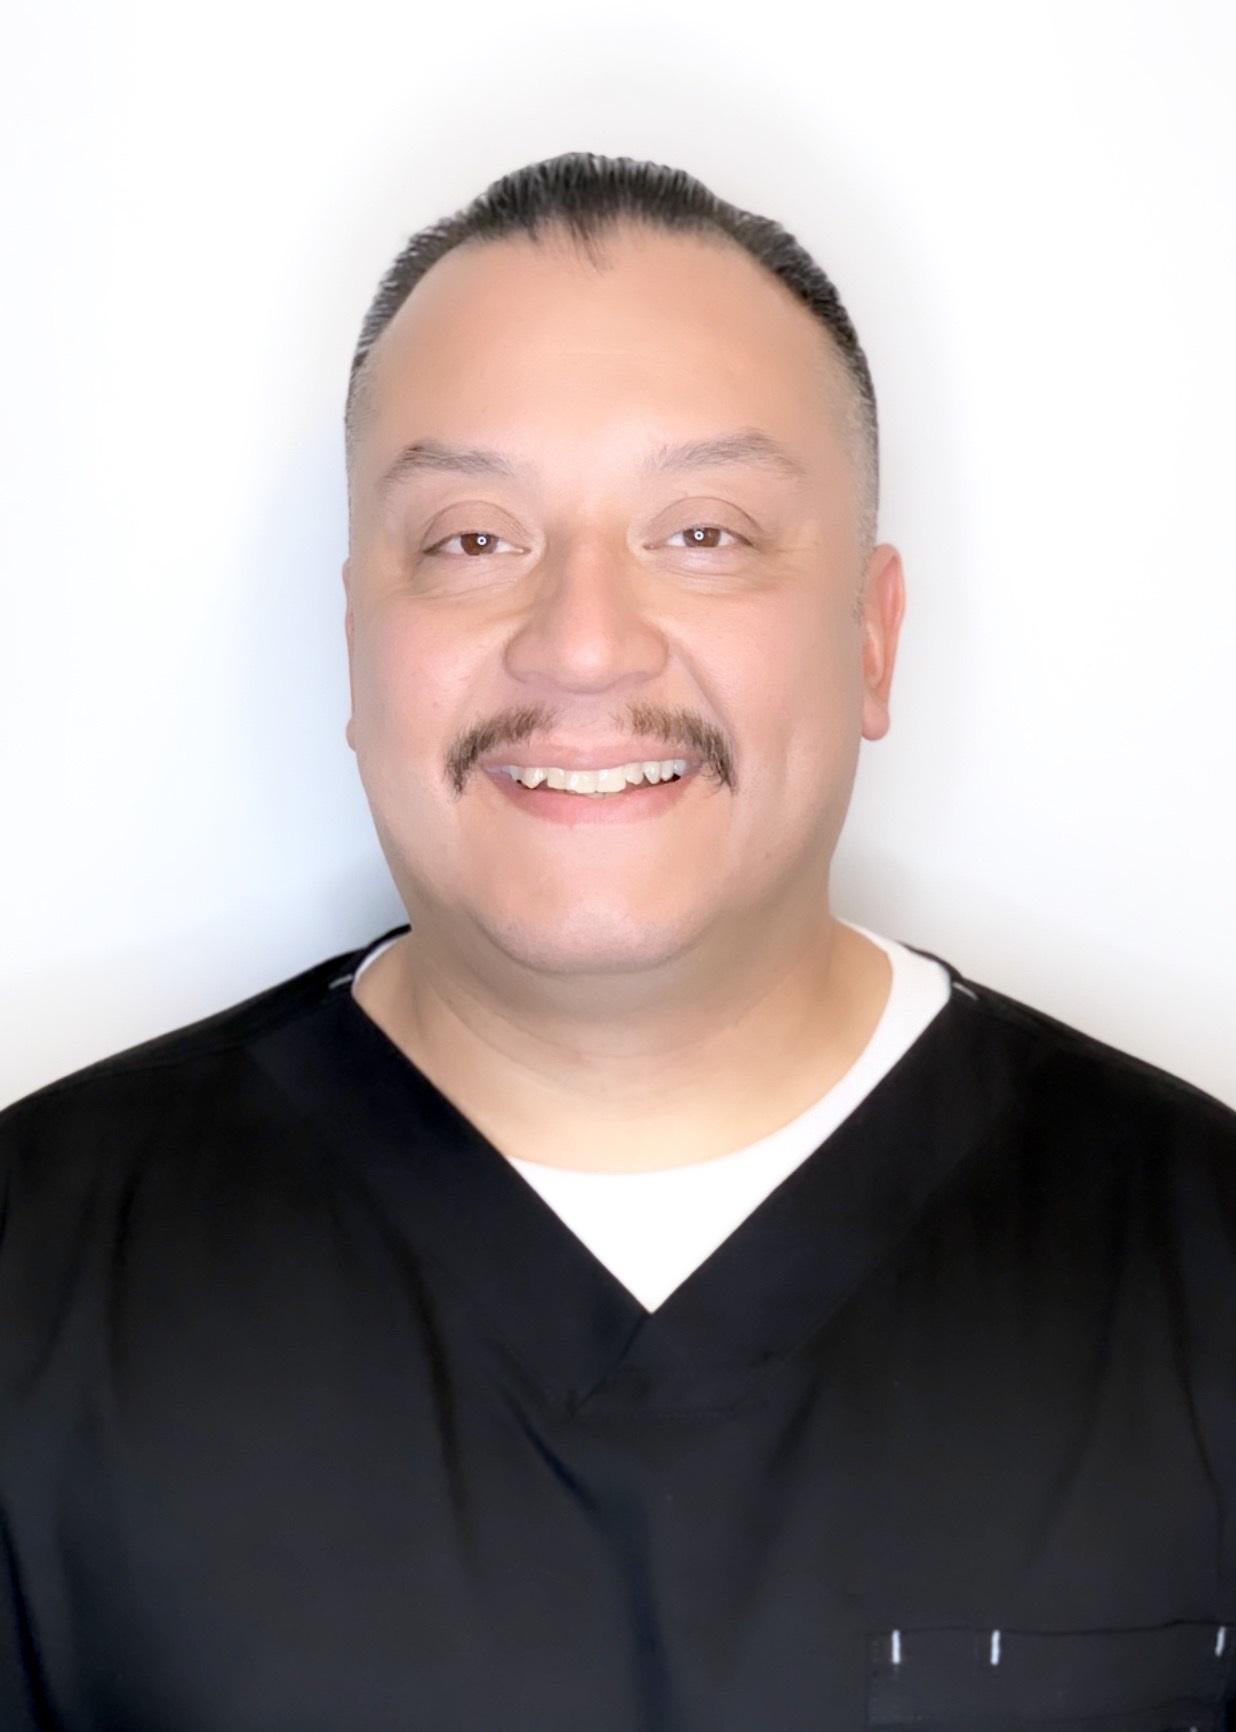 Eddie Cabrera - Dental Sedation Assistant